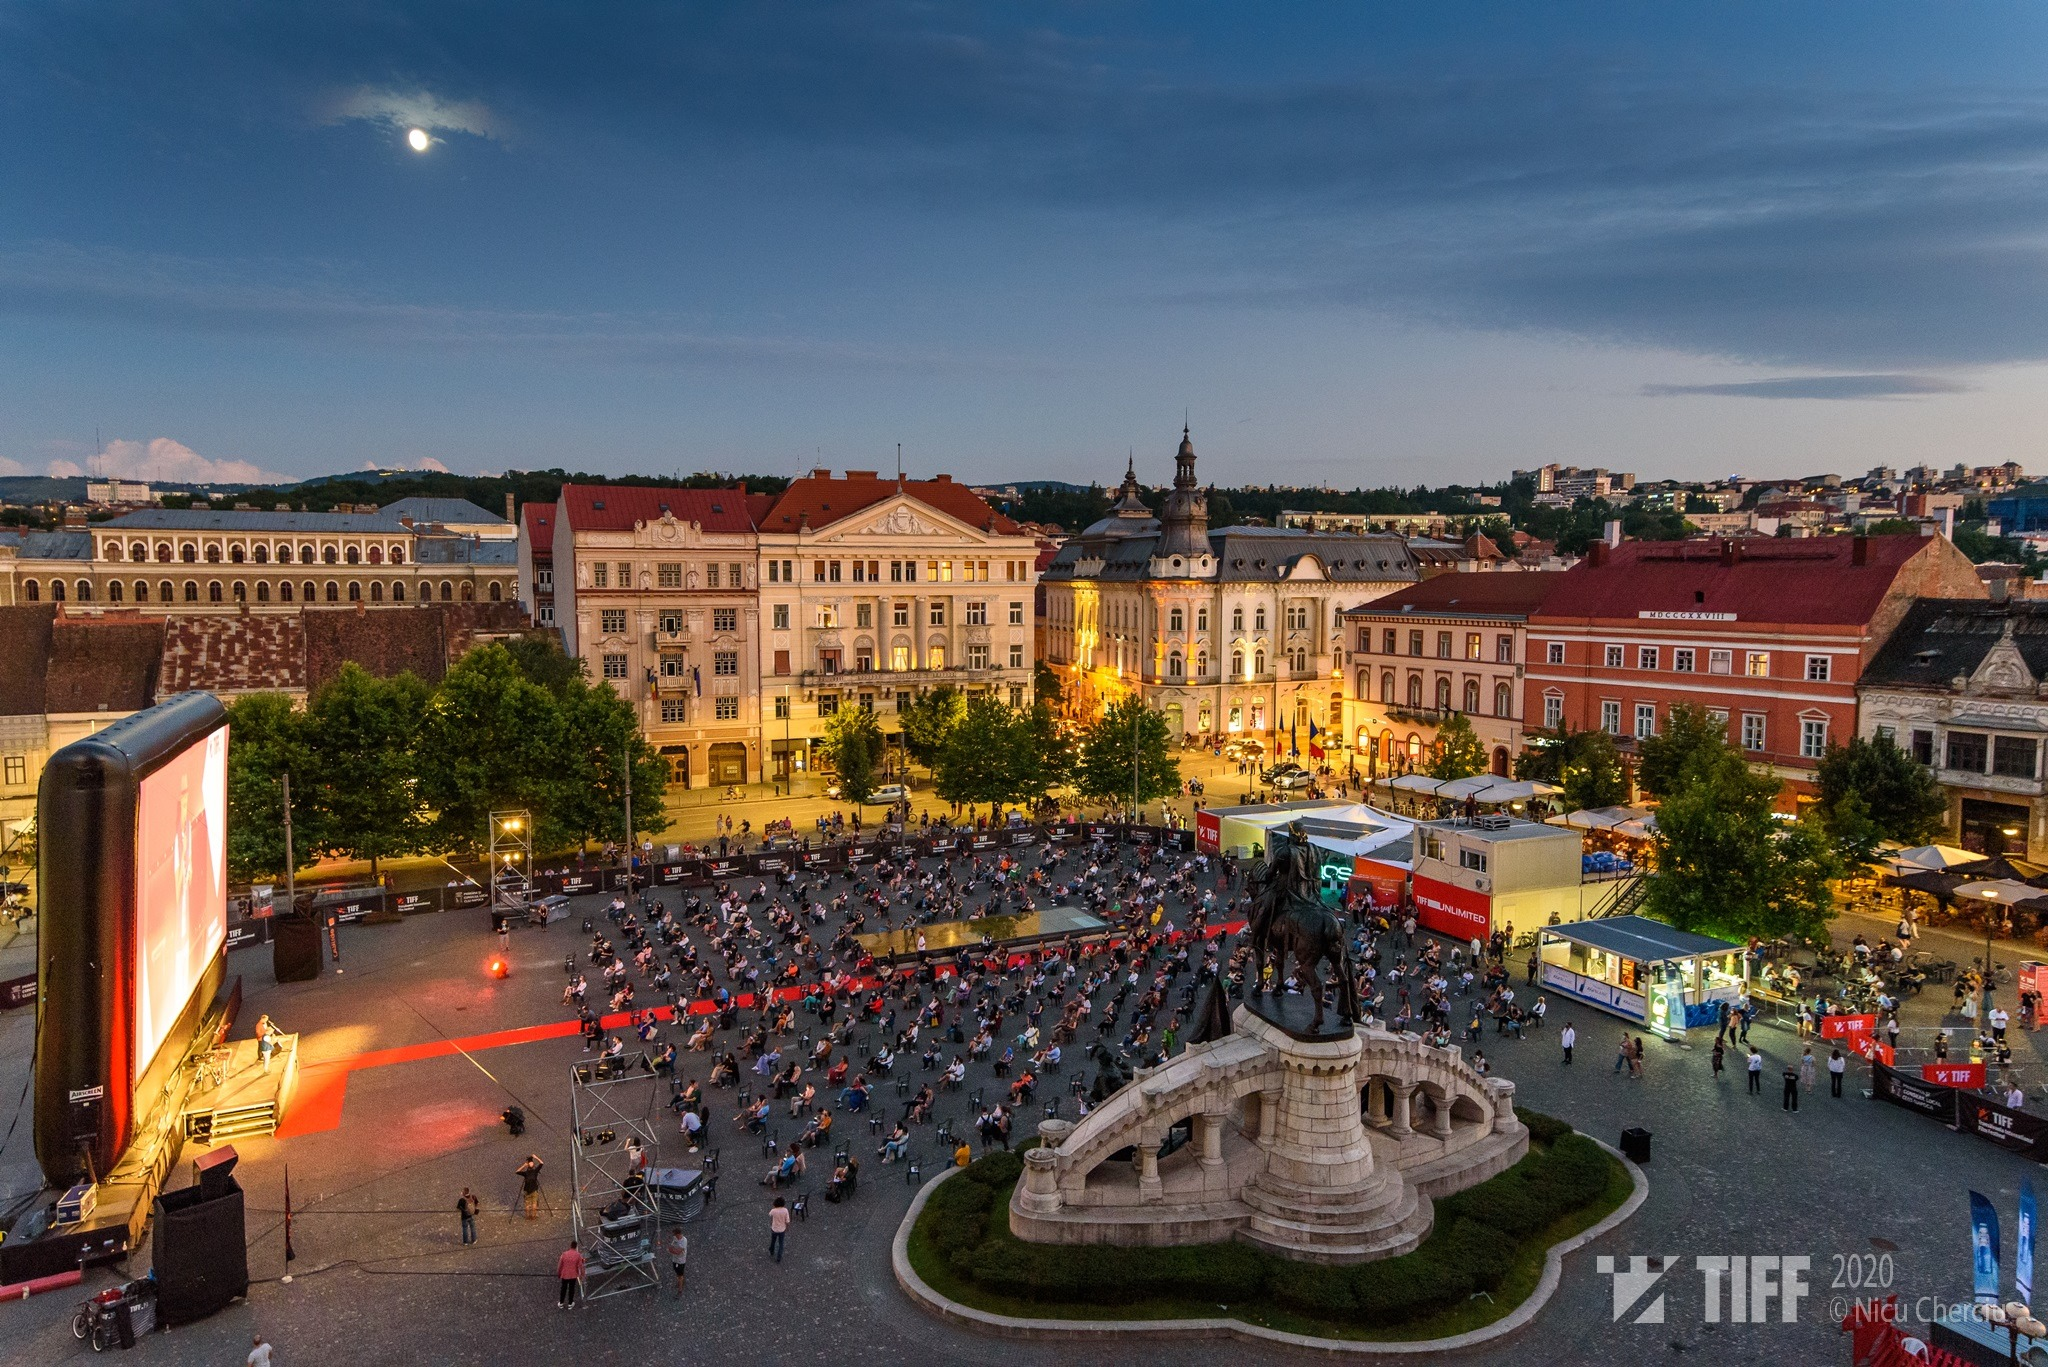 TIFF Cluj